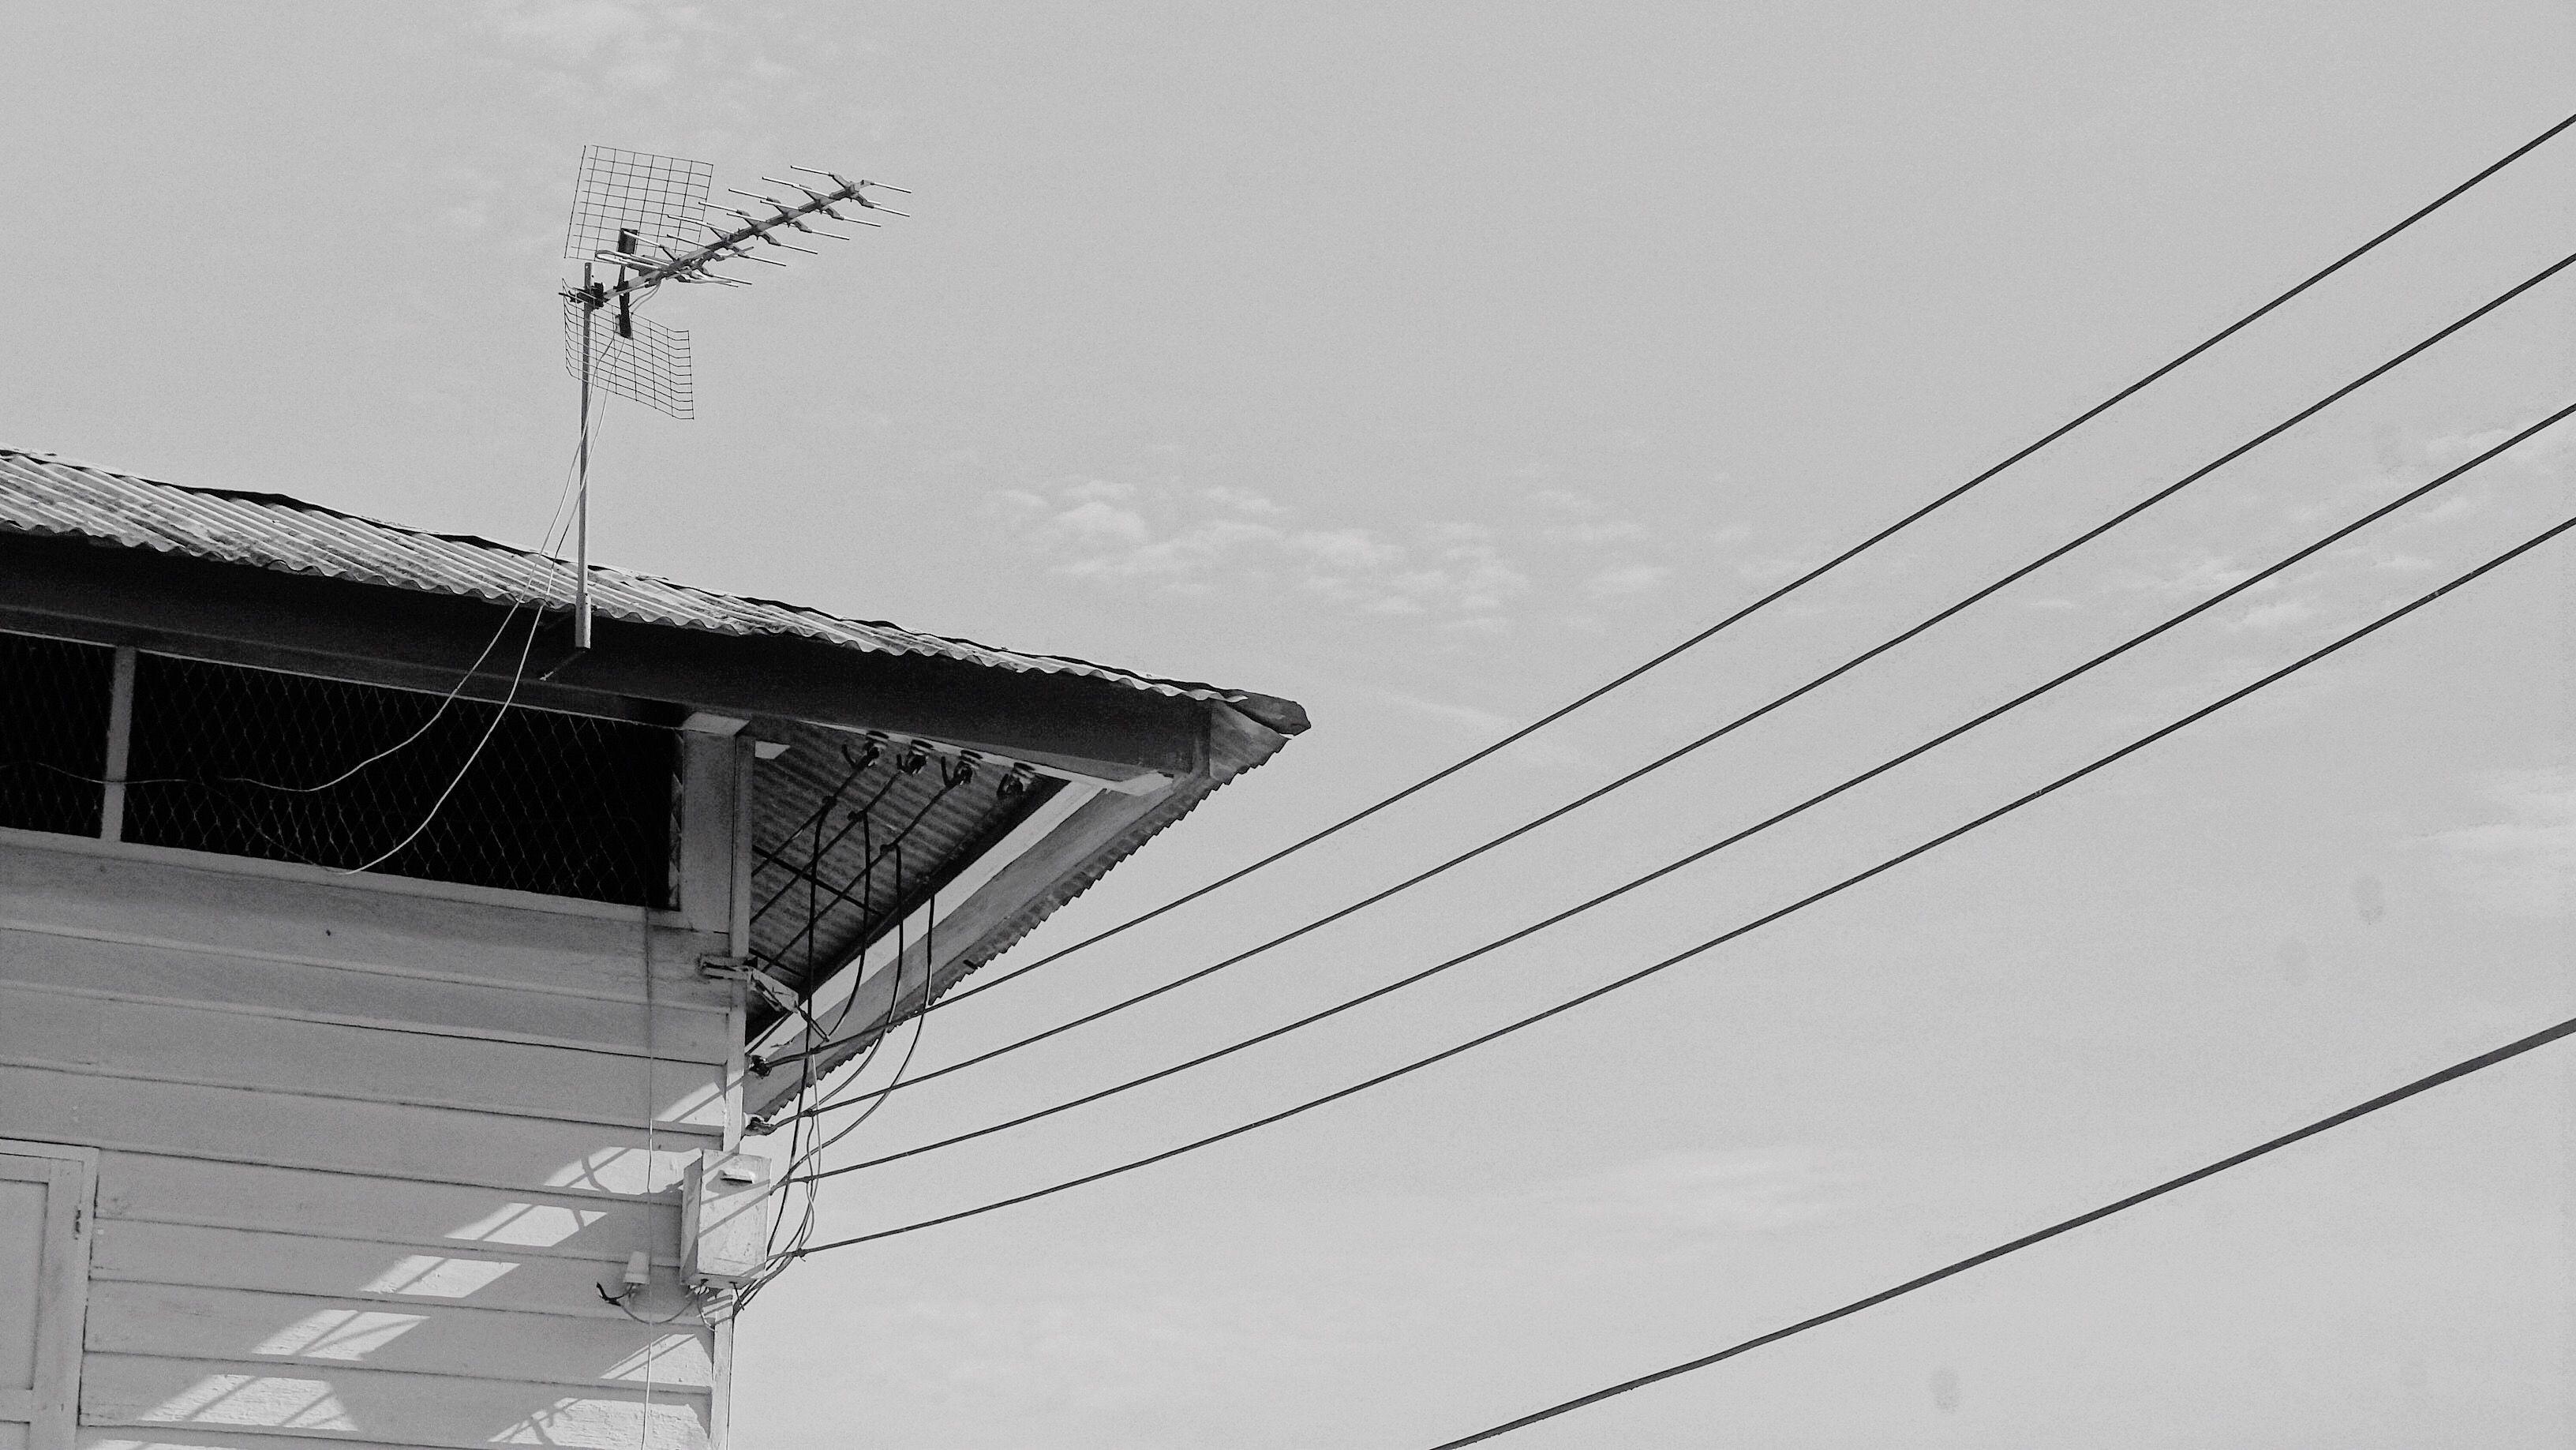 Choosing an Outdoor Antenna with Antenna Web